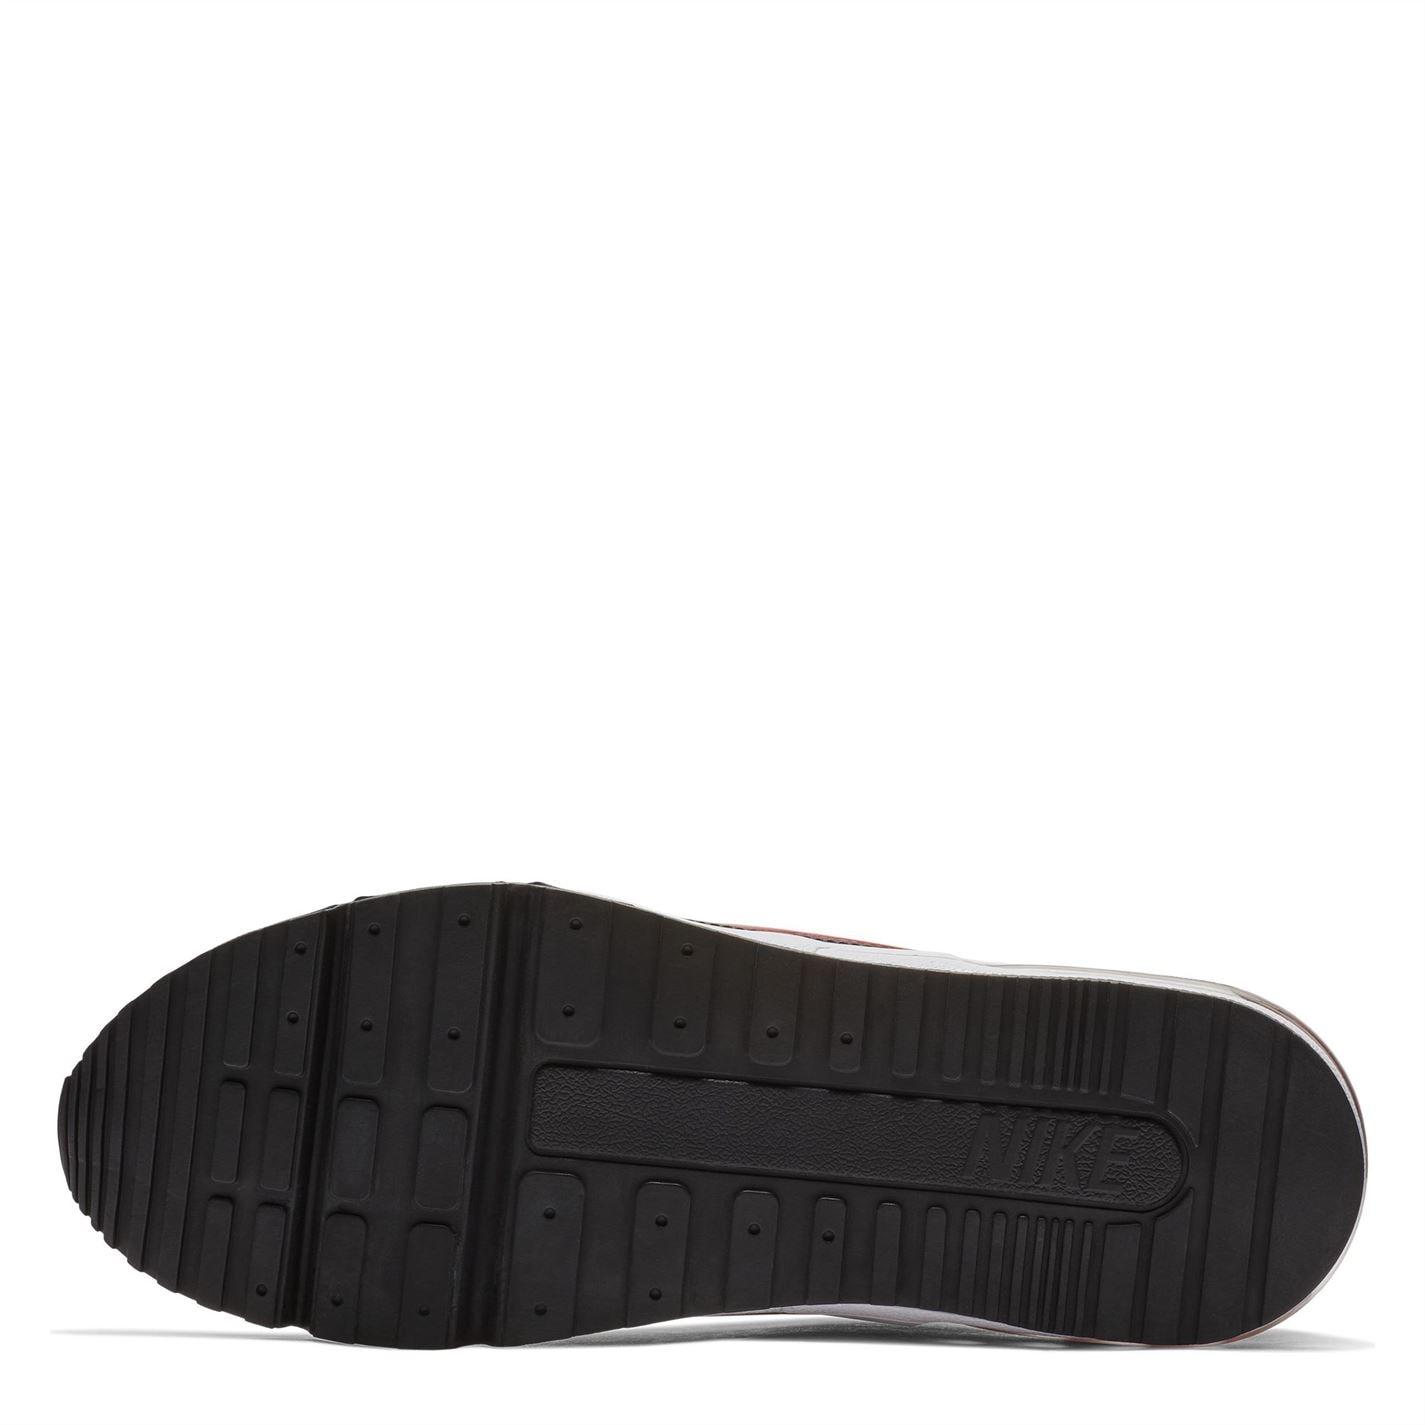 Pánske tenisky Nike Air Max LTD 3